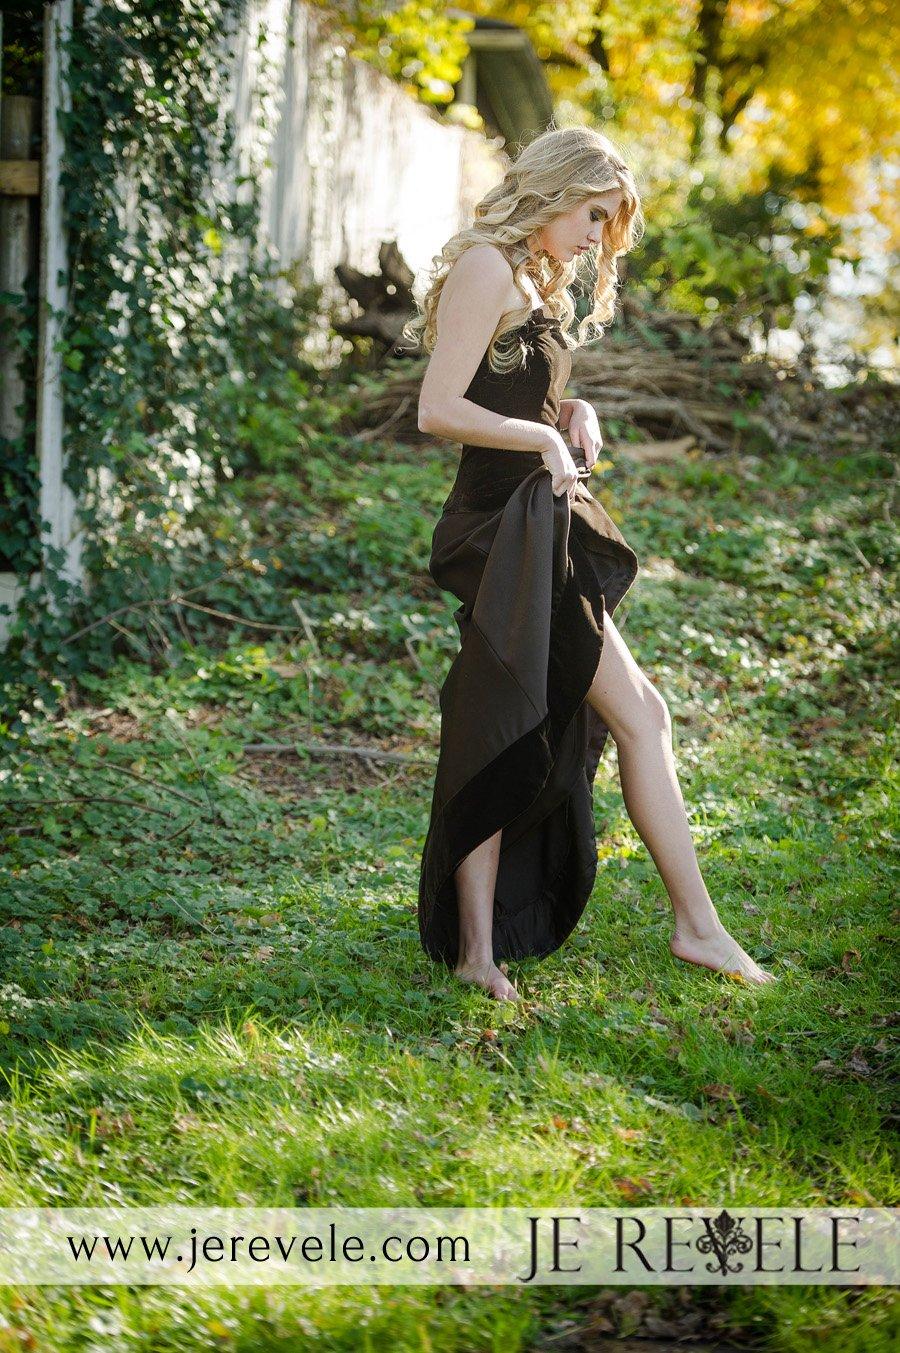 ALEXANDRIA MORGAN RUNS STRAPLESS